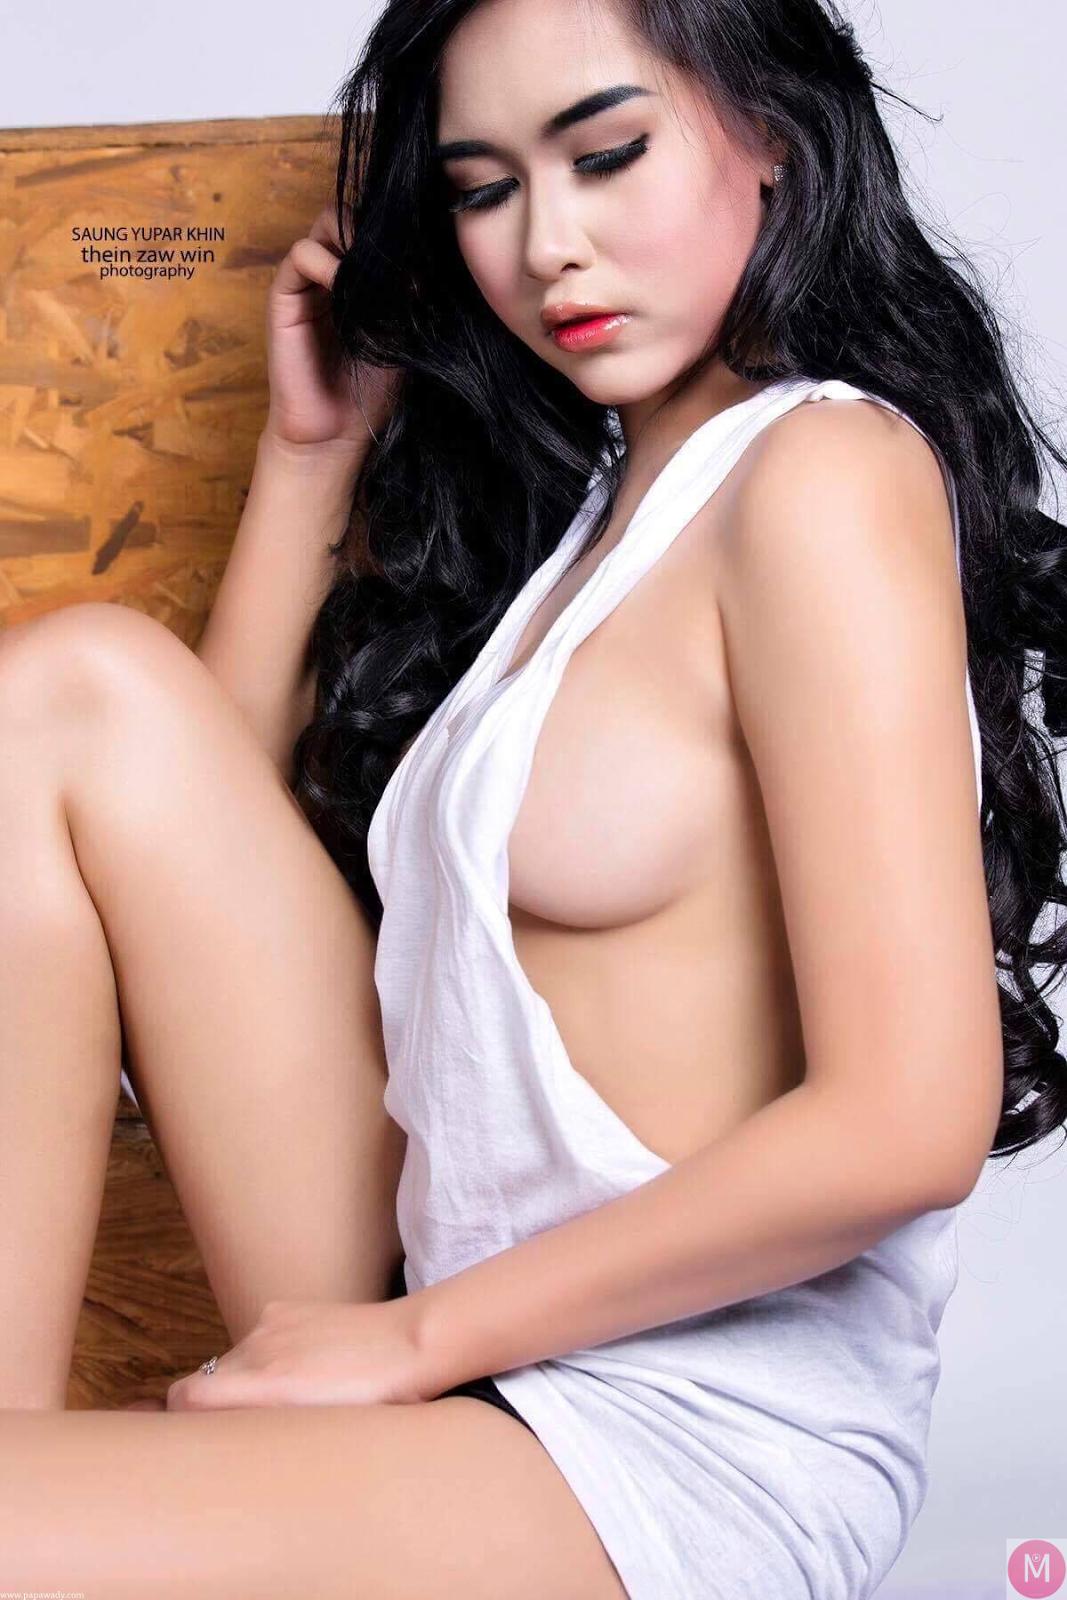 Saung Yu Par Khin Flan Flan Studio Photoshoot